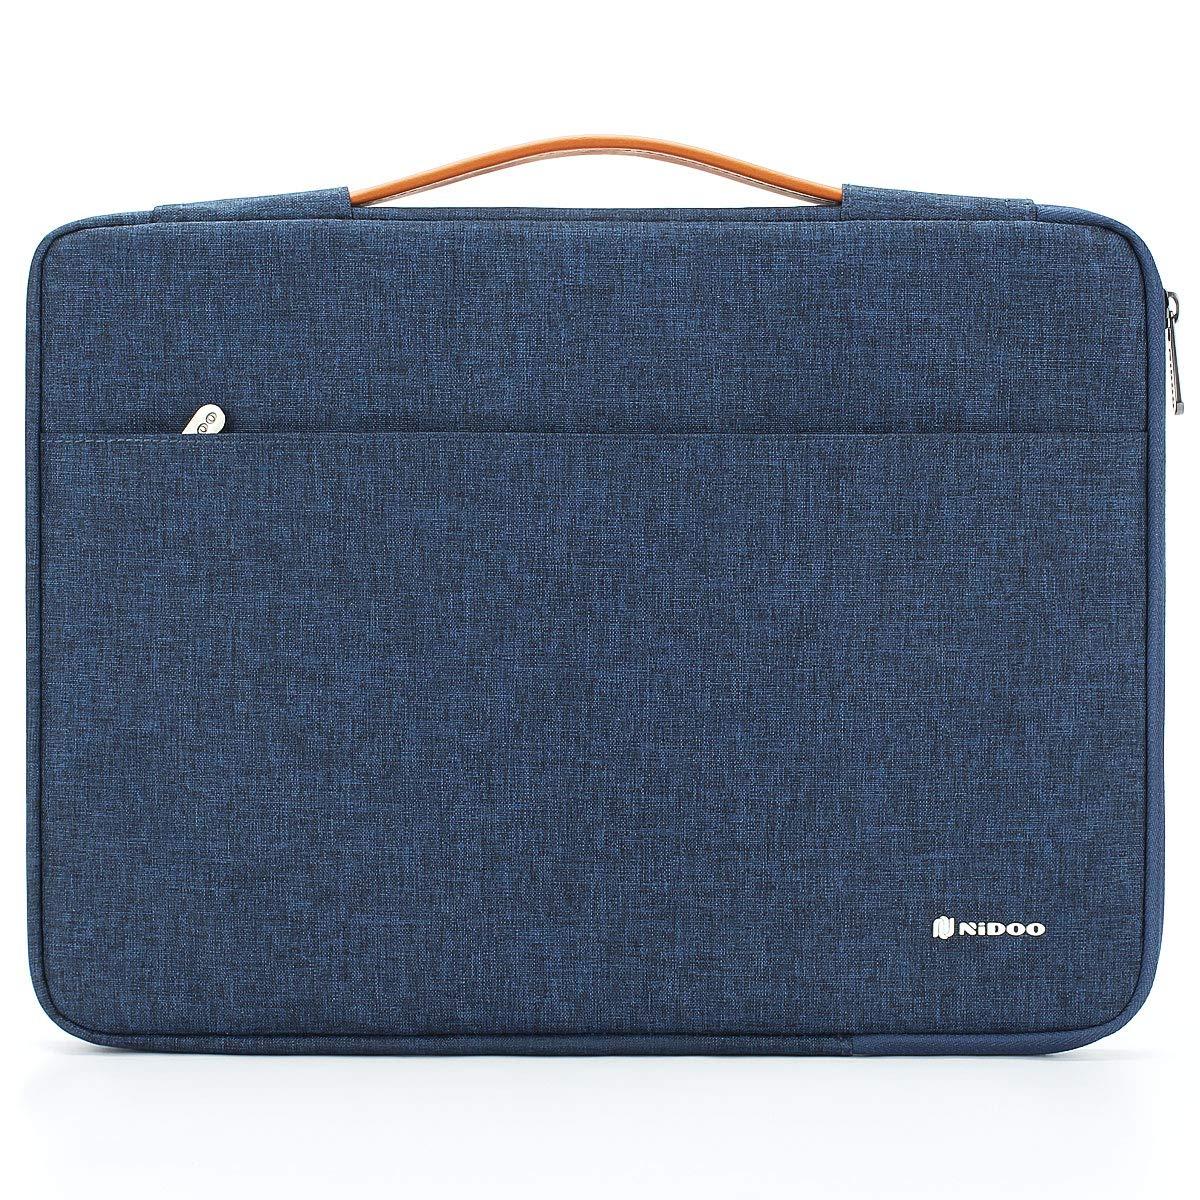 "NIDOO 11"" Laptop Sleeve case Notebook Bag Protective Handbag for 12.9"" iPad Pro 2018/13"" MacBook Air 2018/13"" MacBook Pro Touch Bar / 12.3"" Surface Pro 6 4 7/13"" Huawei MateBook 13 2020, Blue"